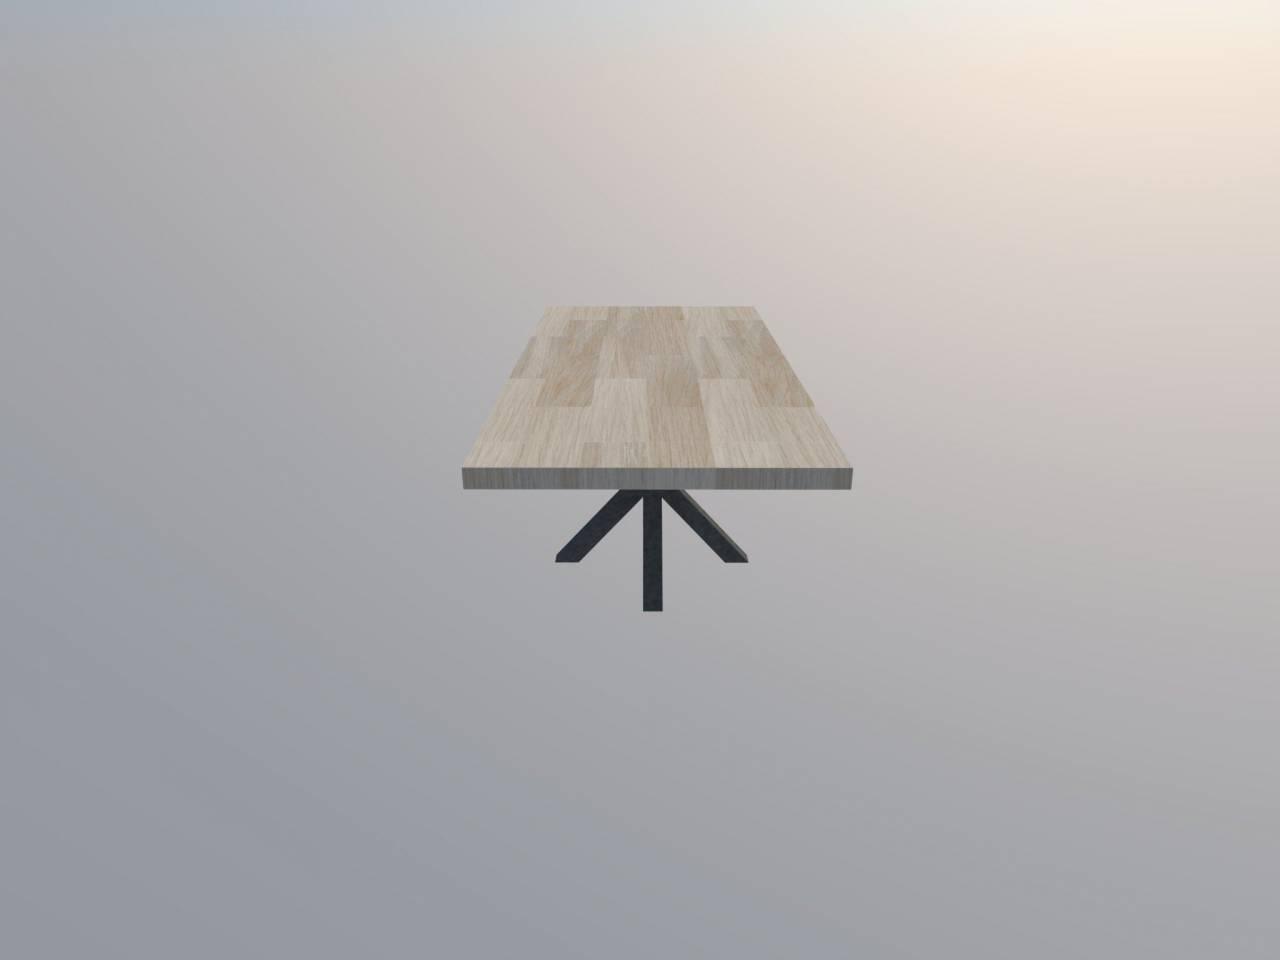 Ster onderstel Industriële Stalen Frame Houten Blad